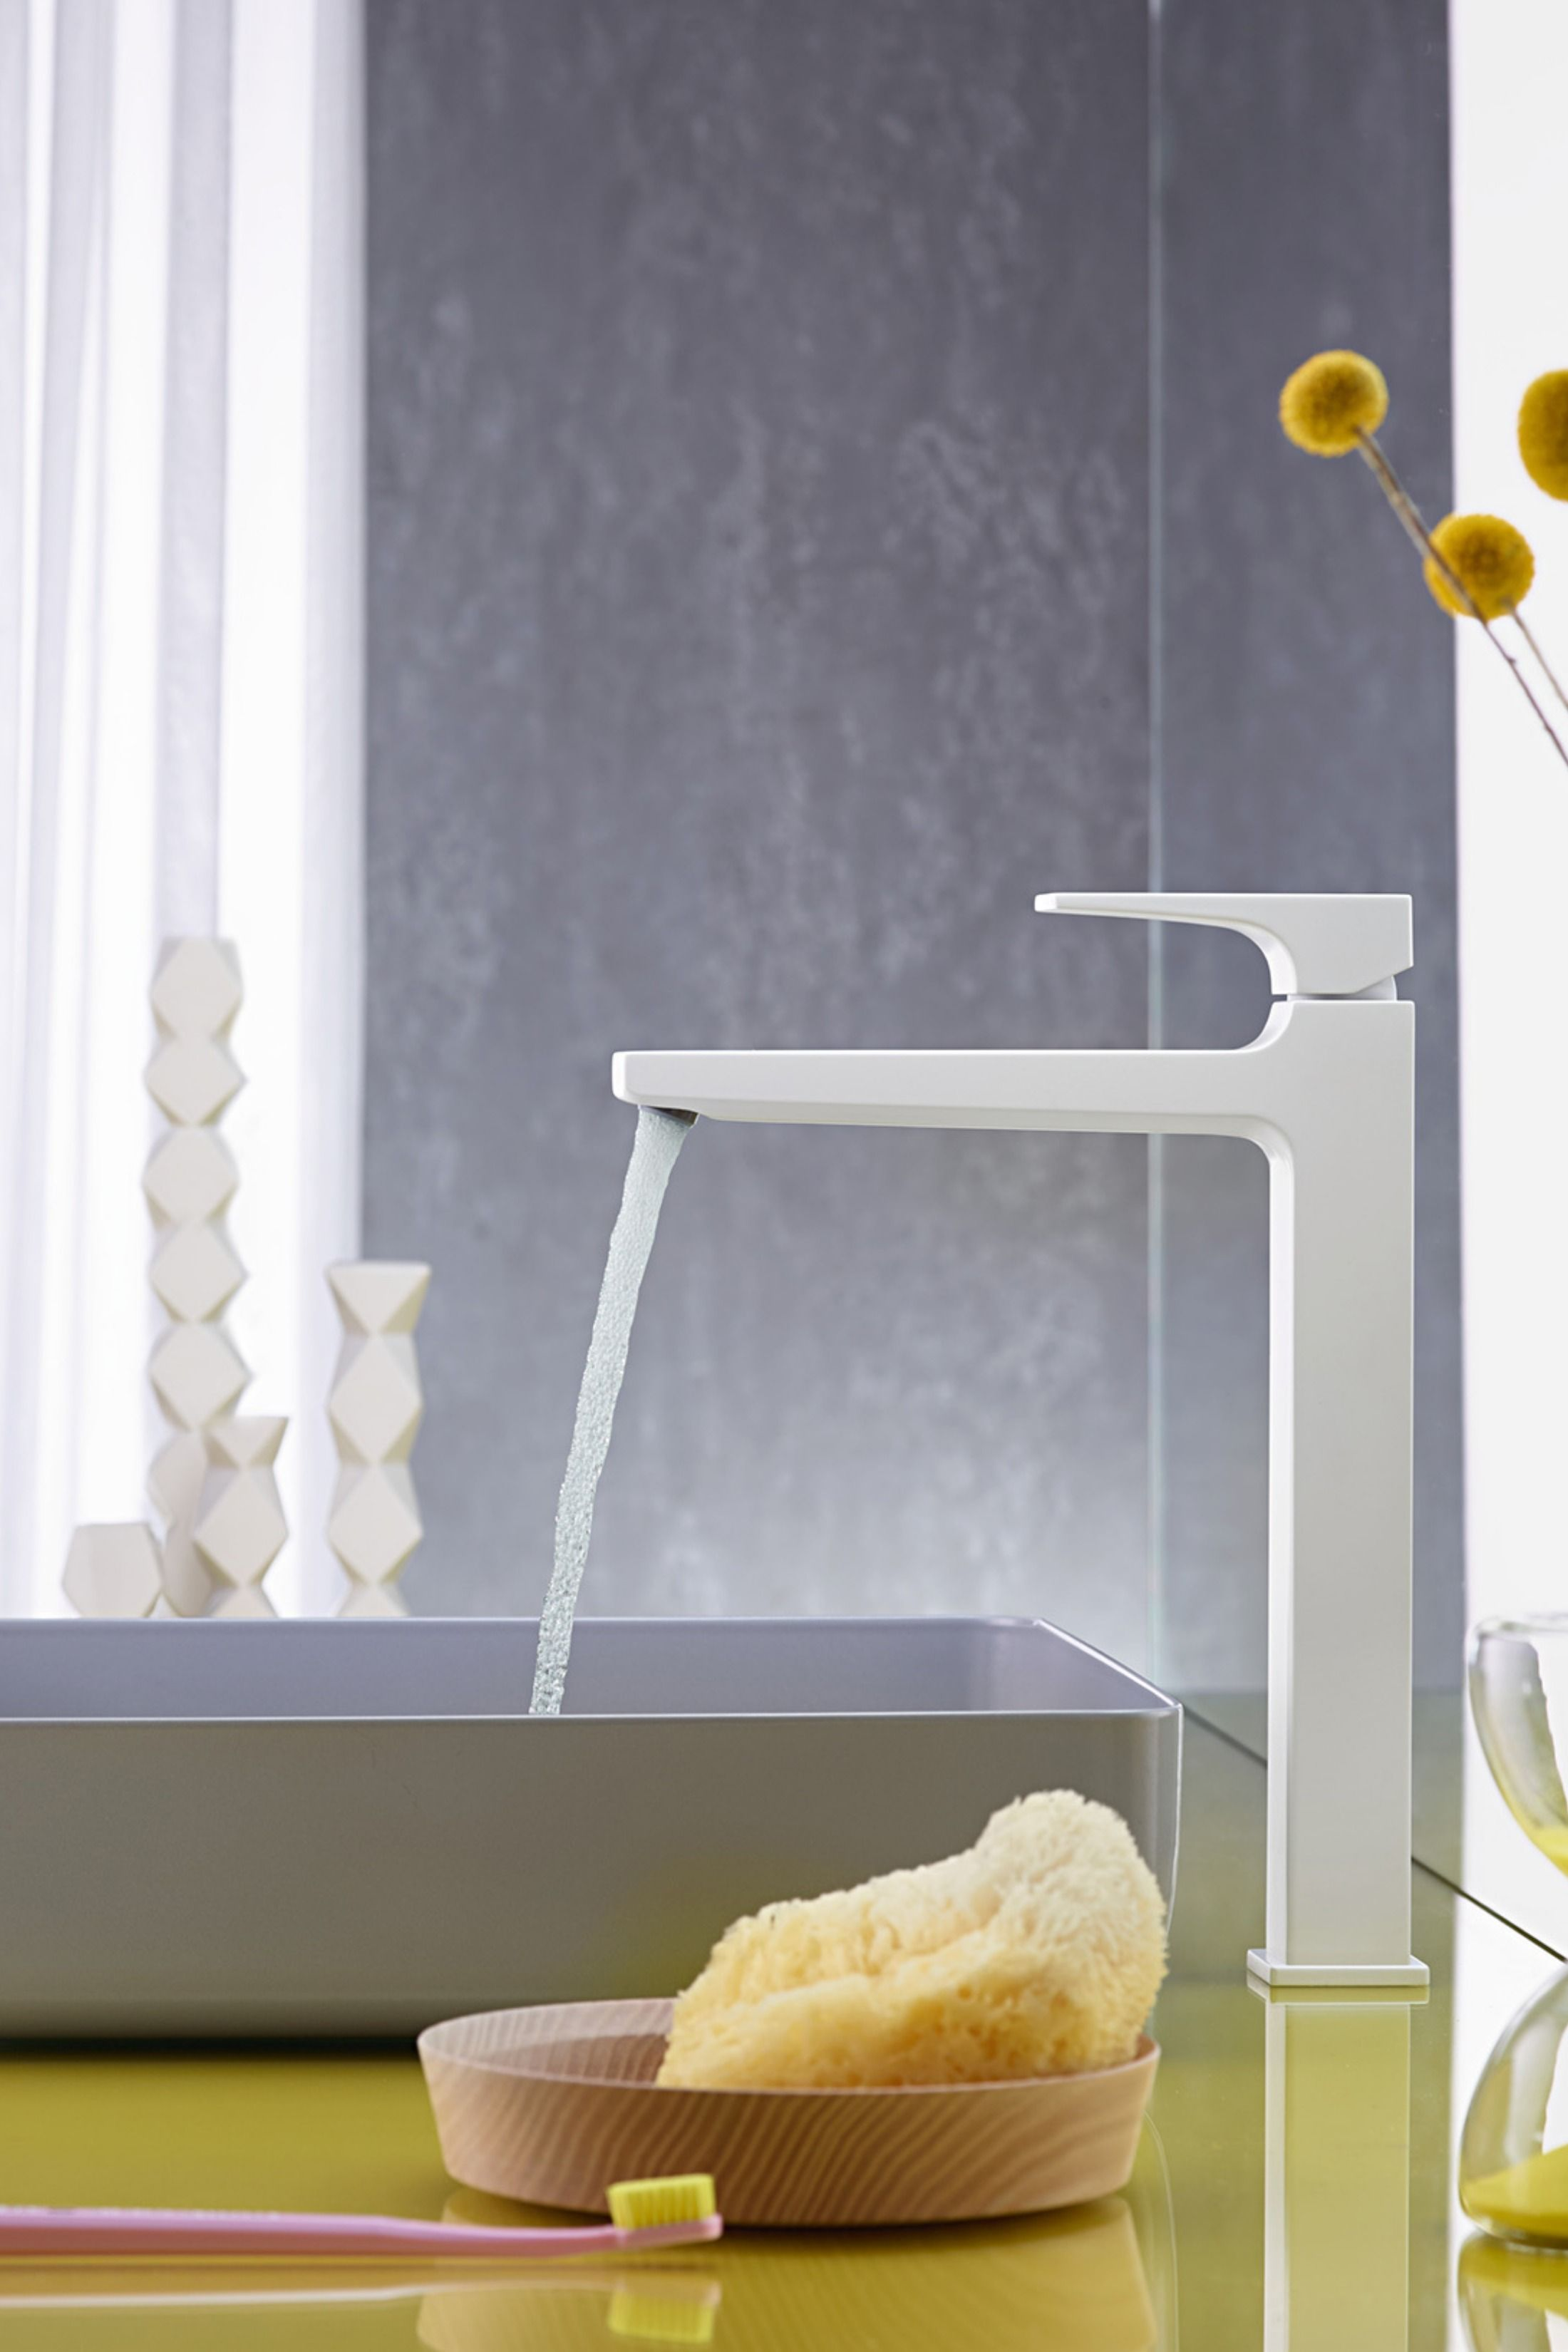 Hansgrohe Metropol Einhebel Waschtischmischer 260 Mit Hebelgriff U Push Open Fur Waschschusseln Badarmaturen Armaturen Bad Waschschussel